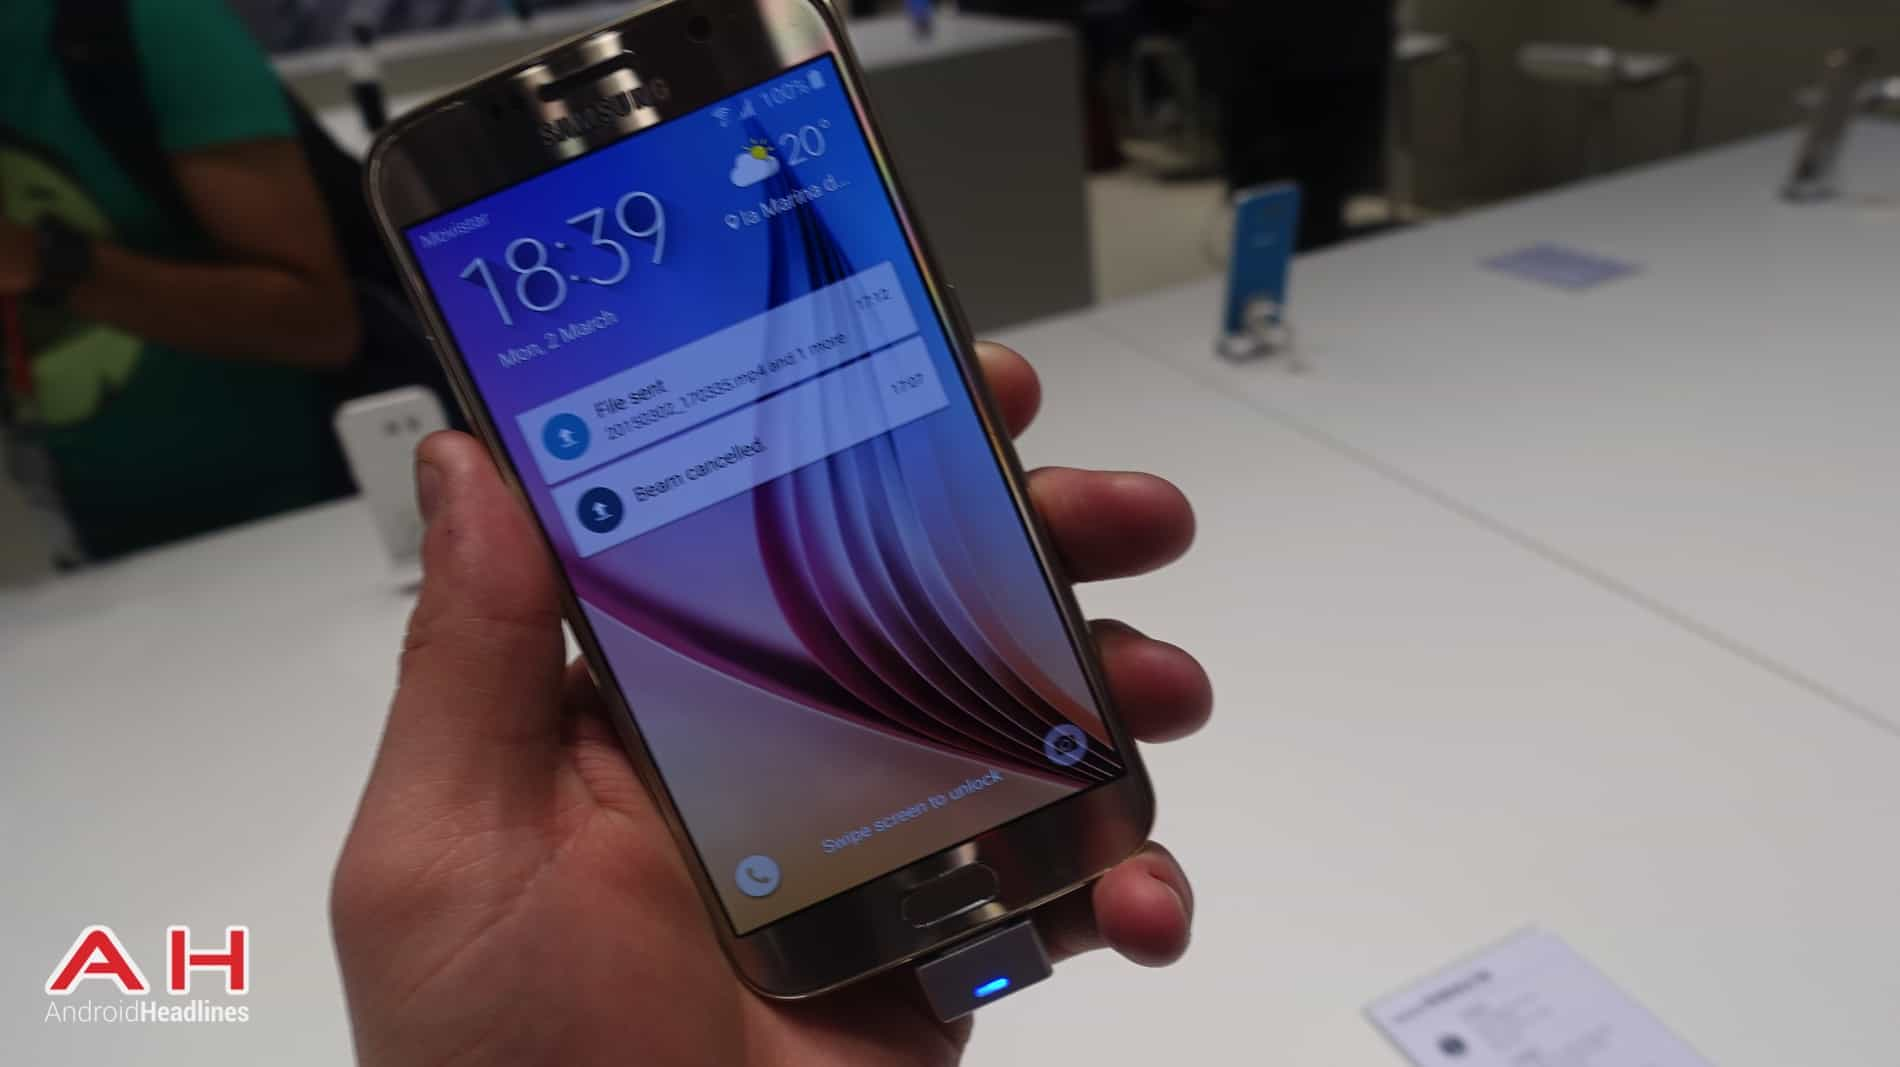 Galaxy S6 and Galaxy S6 Edge MWC AH 16